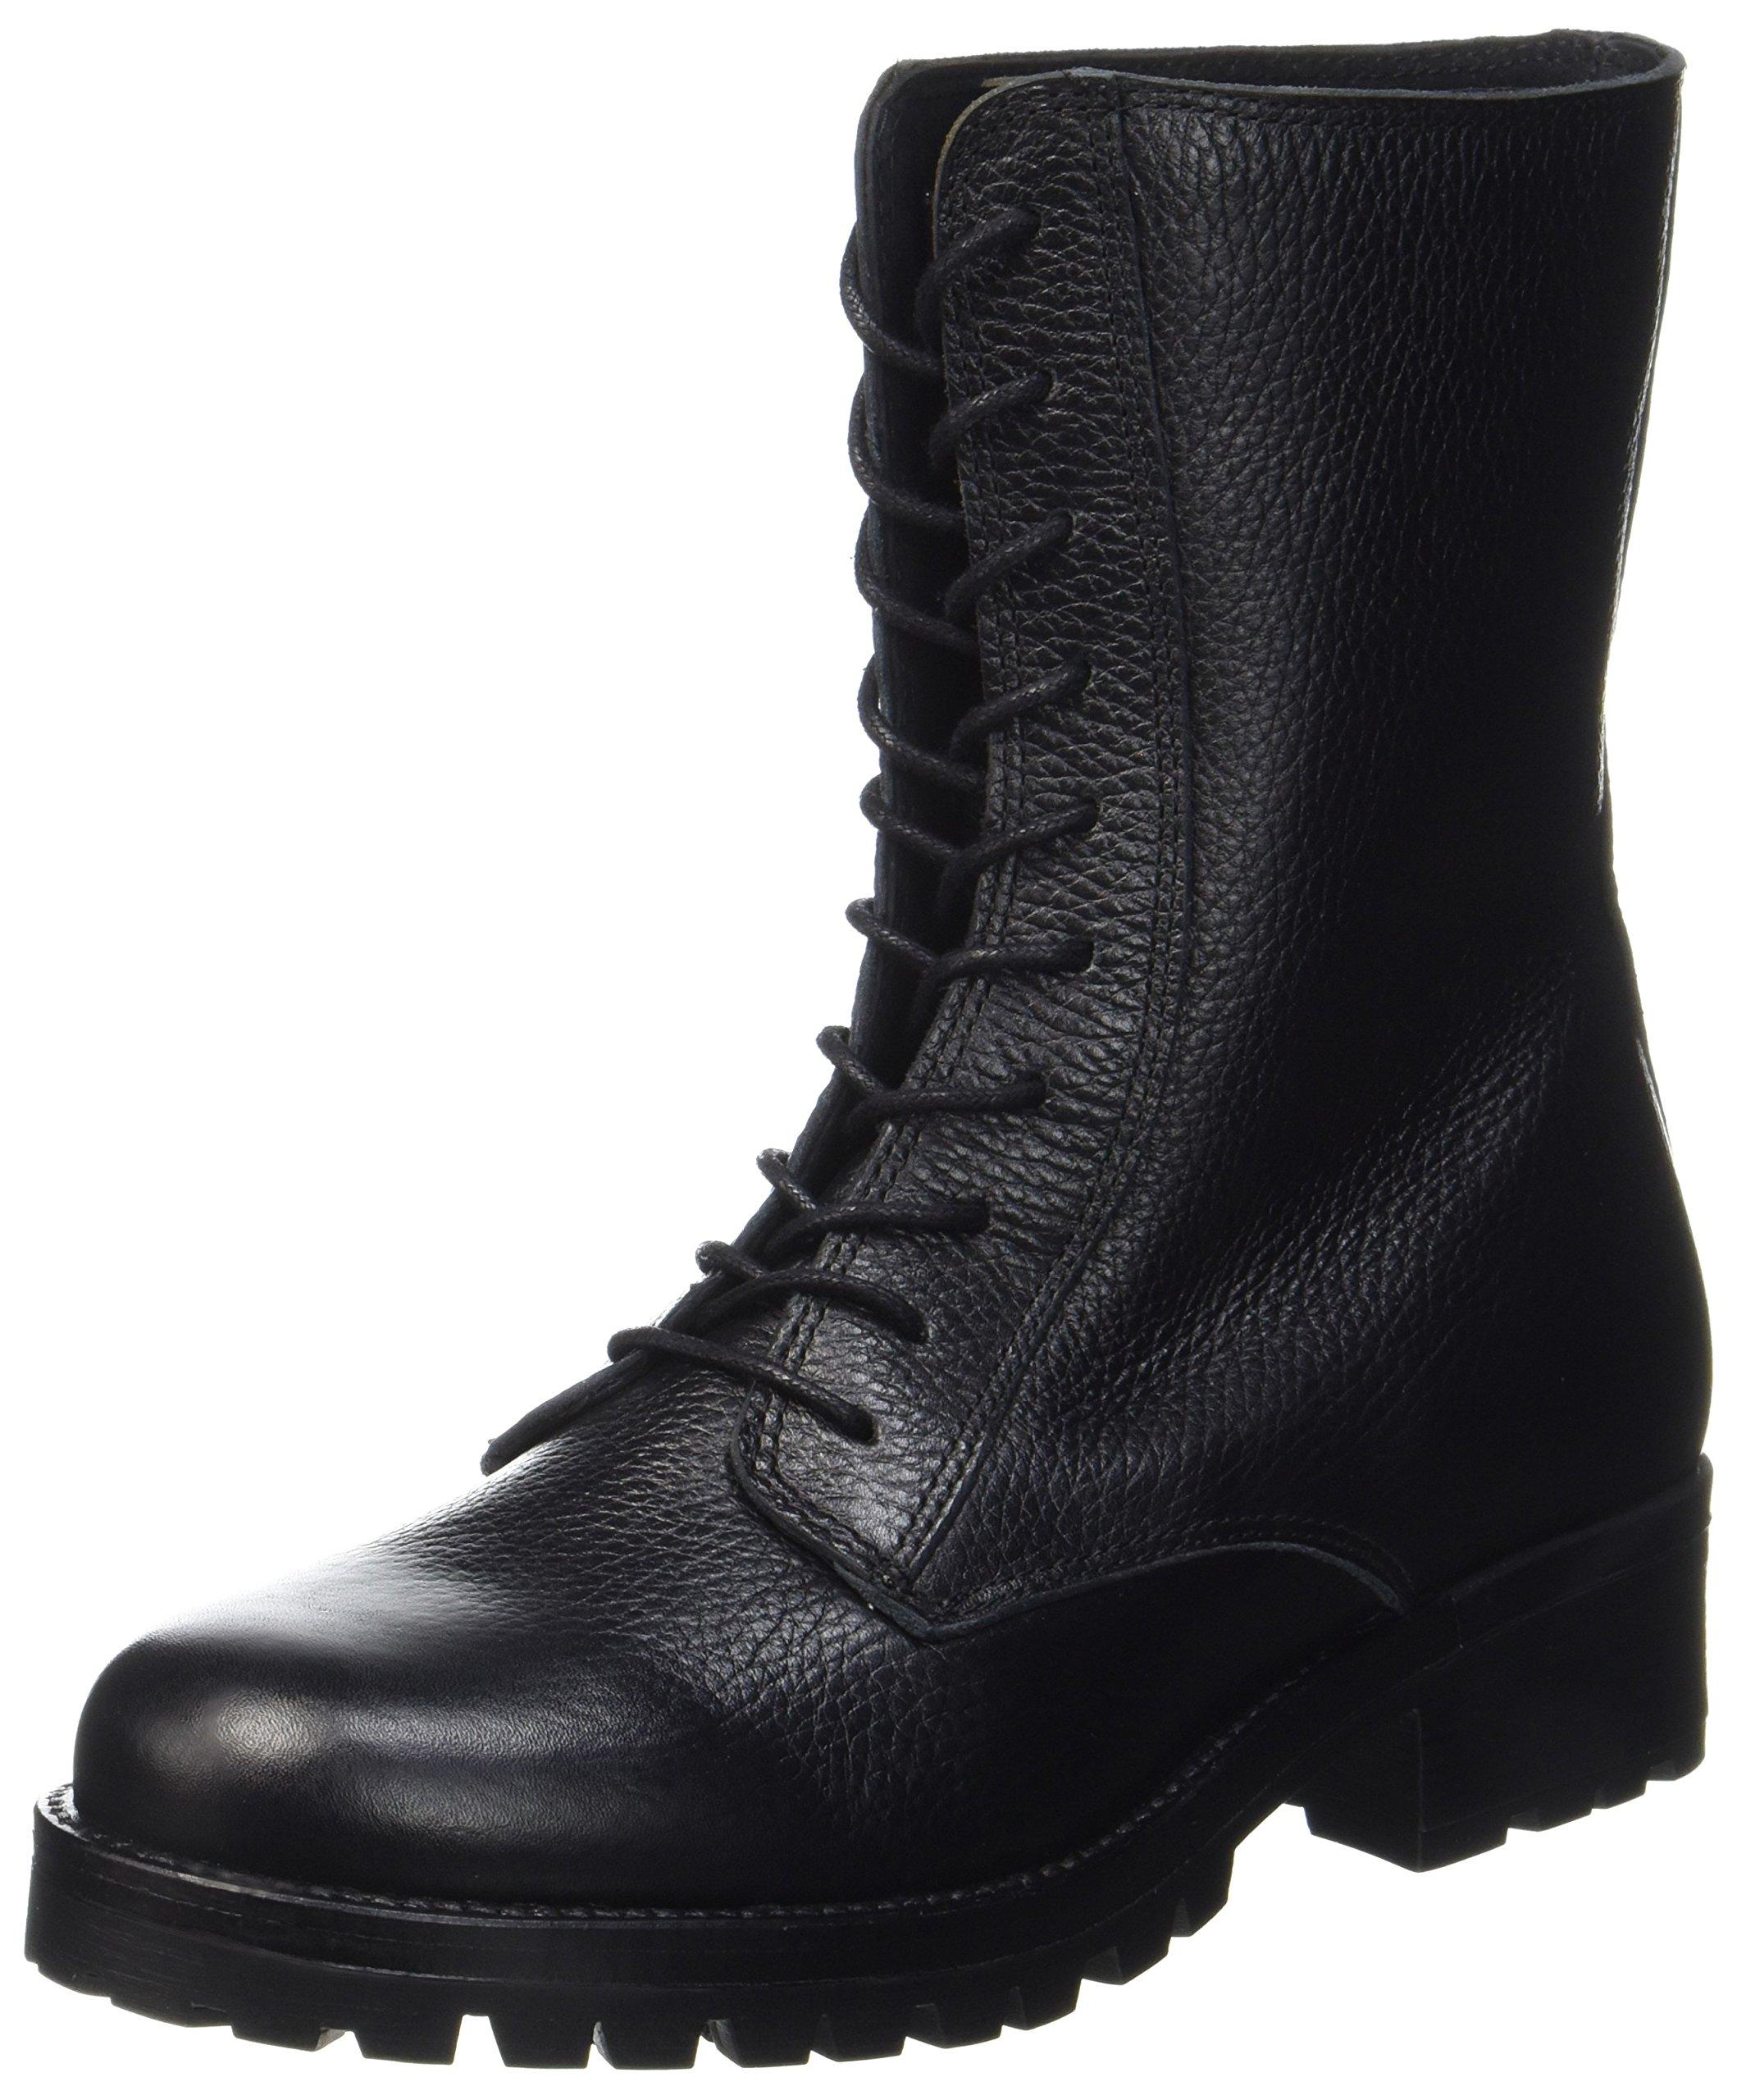 Black40 Bear FemmeNoir110 The Shoe Clare LBottes Eu thsQrd